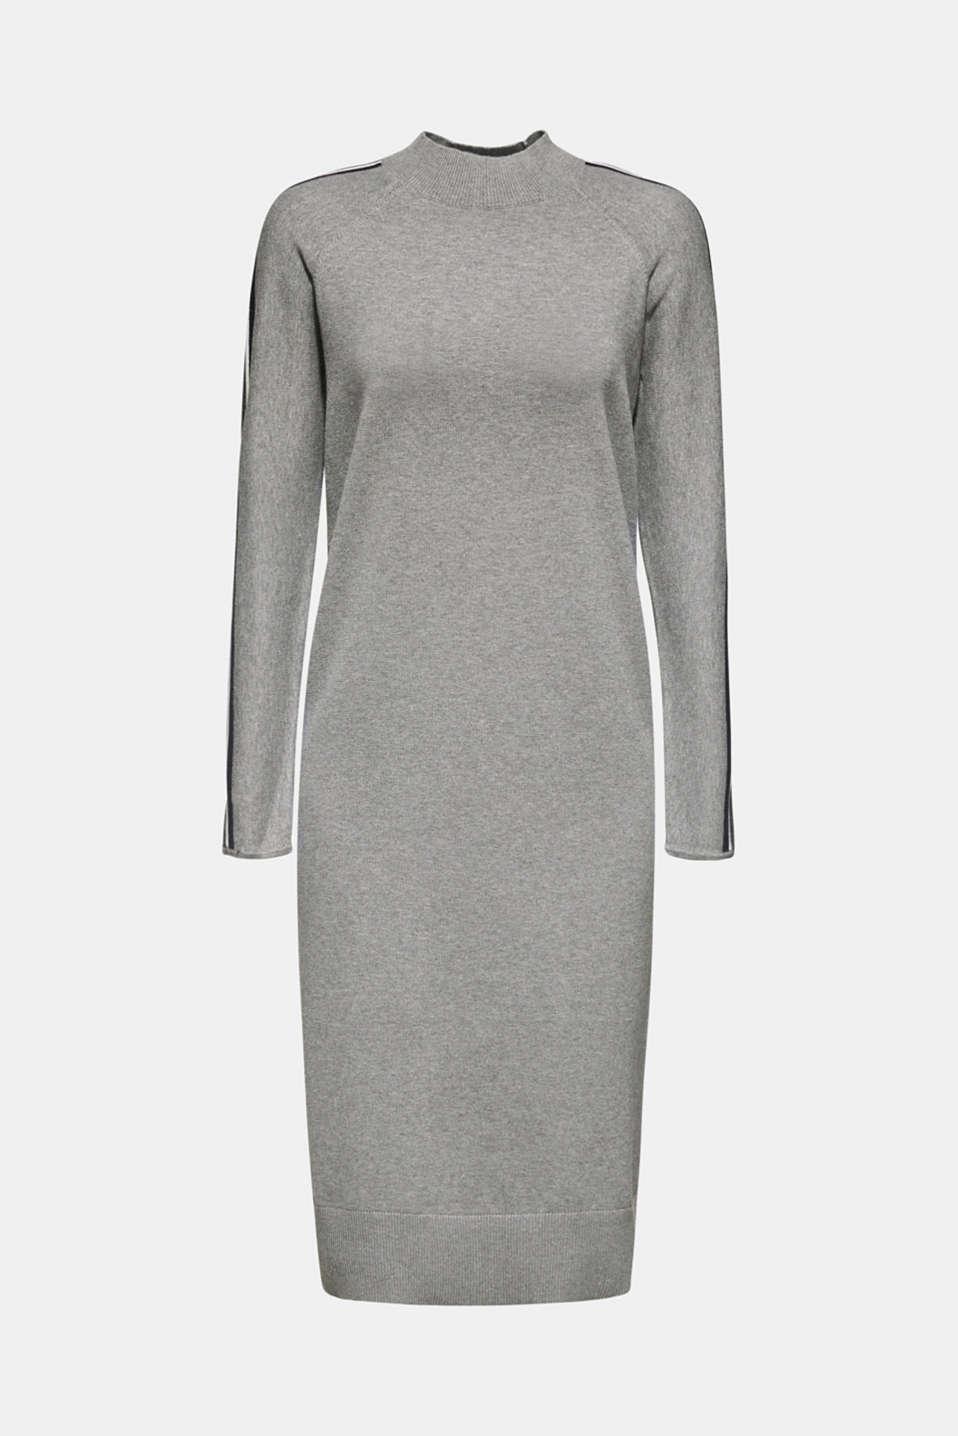 Dresses flat knitted, GUNMETAL 5, detail image number 5